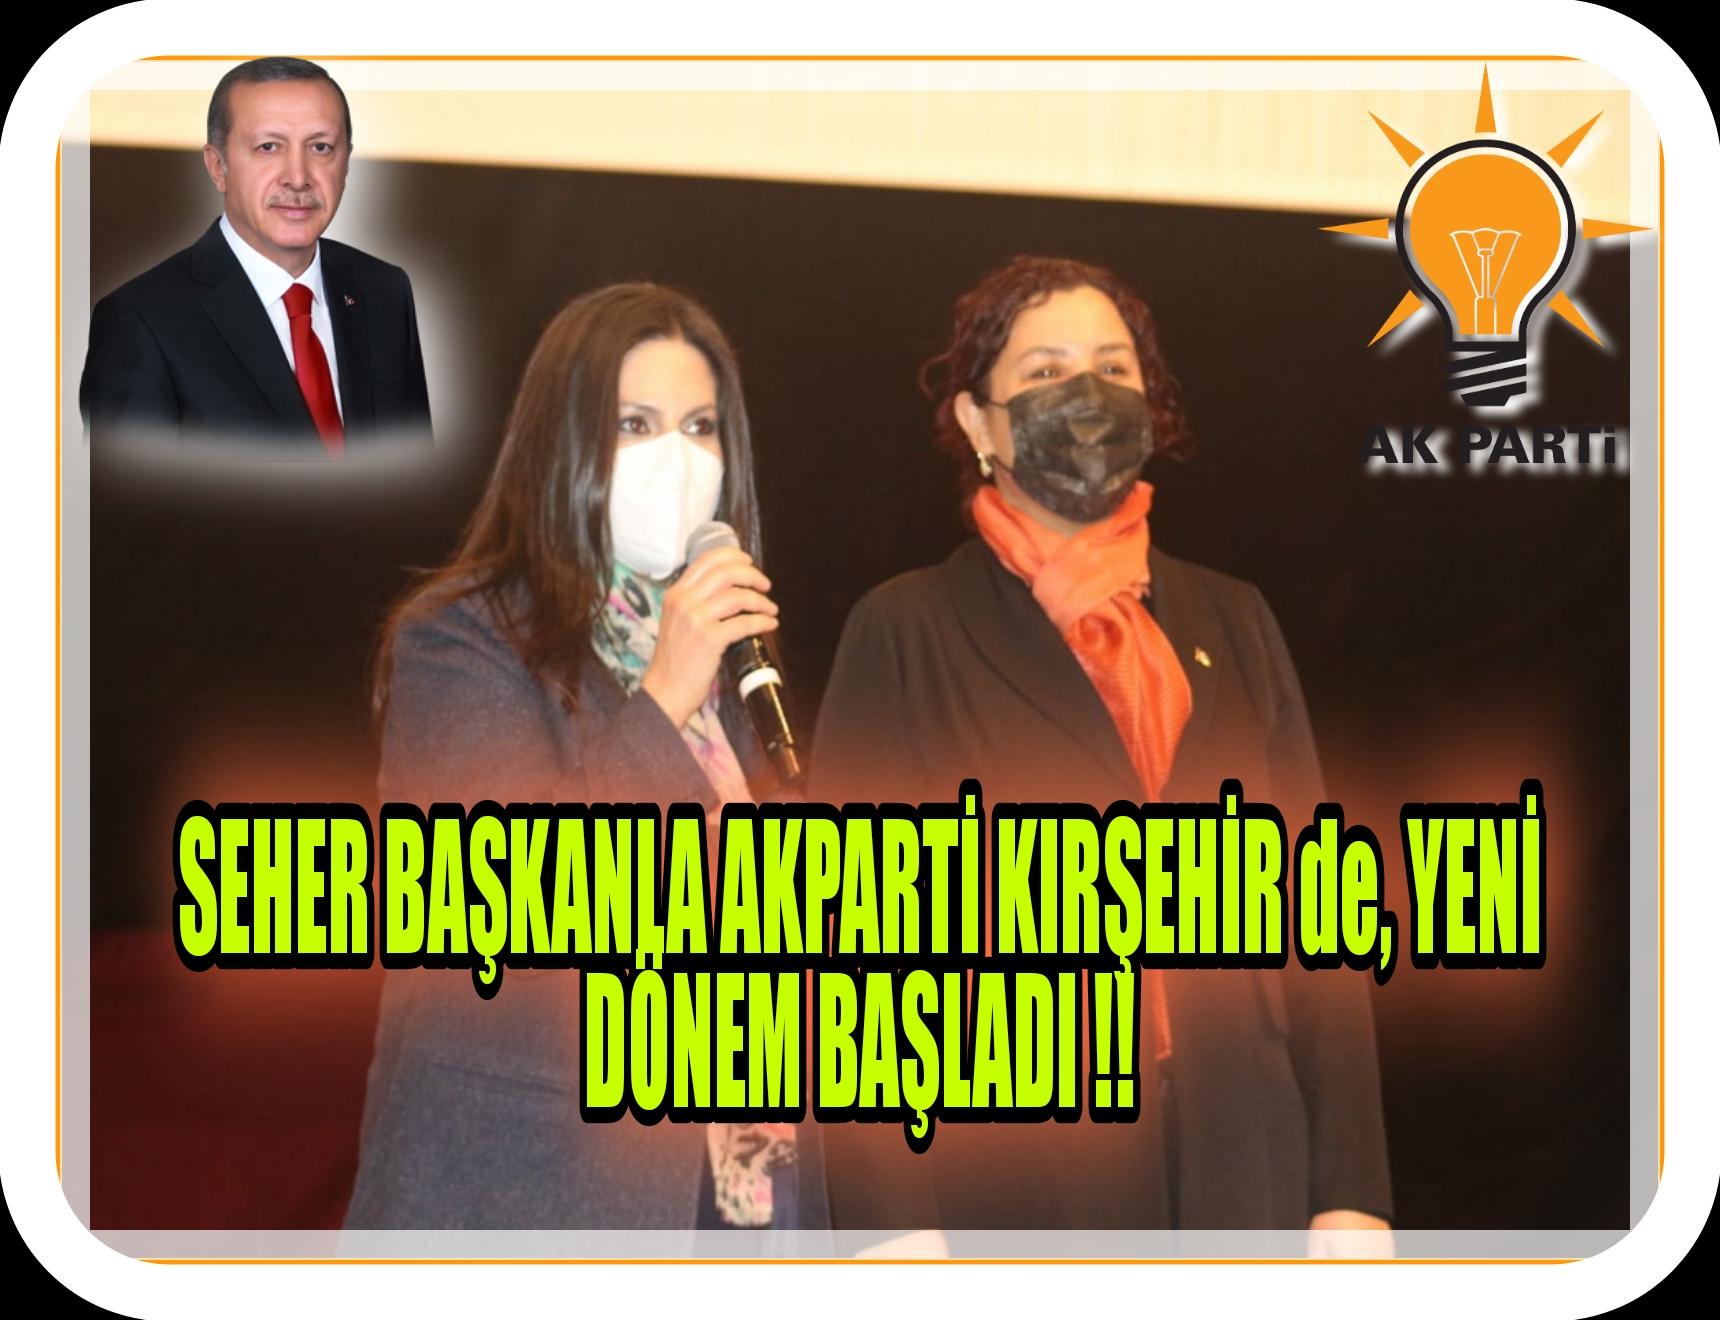 ARTIK RESMEN İL BAŞKANI SEHER ÜNSAL !!